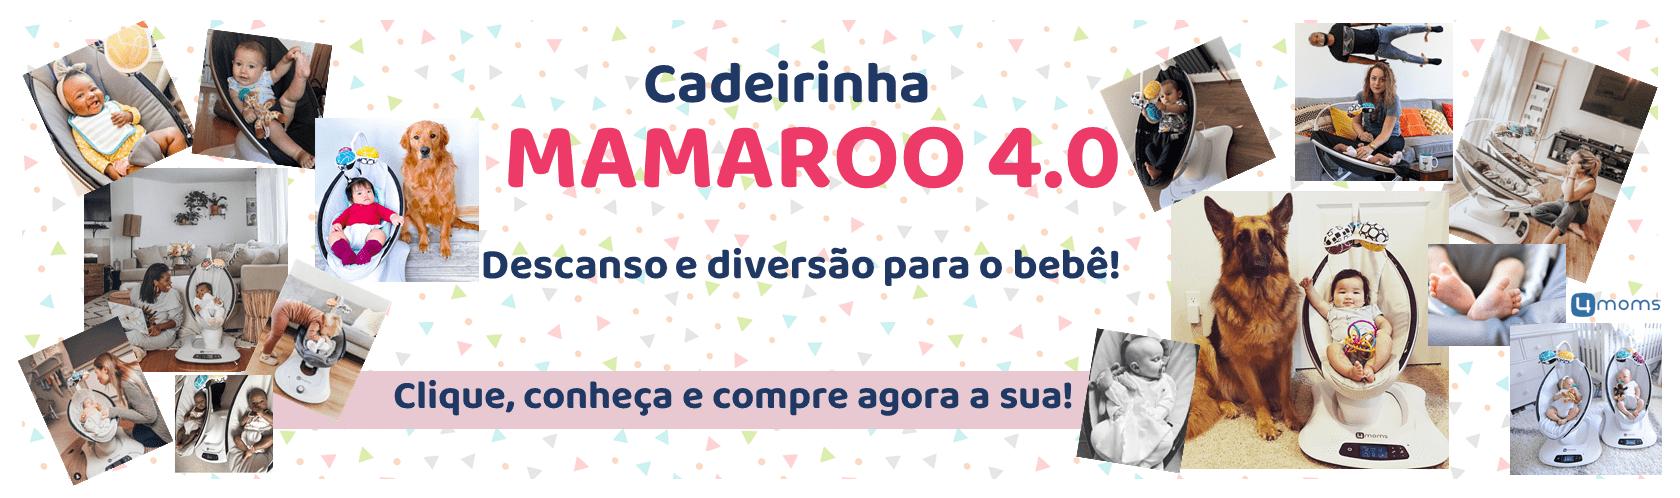 Mamaroo4